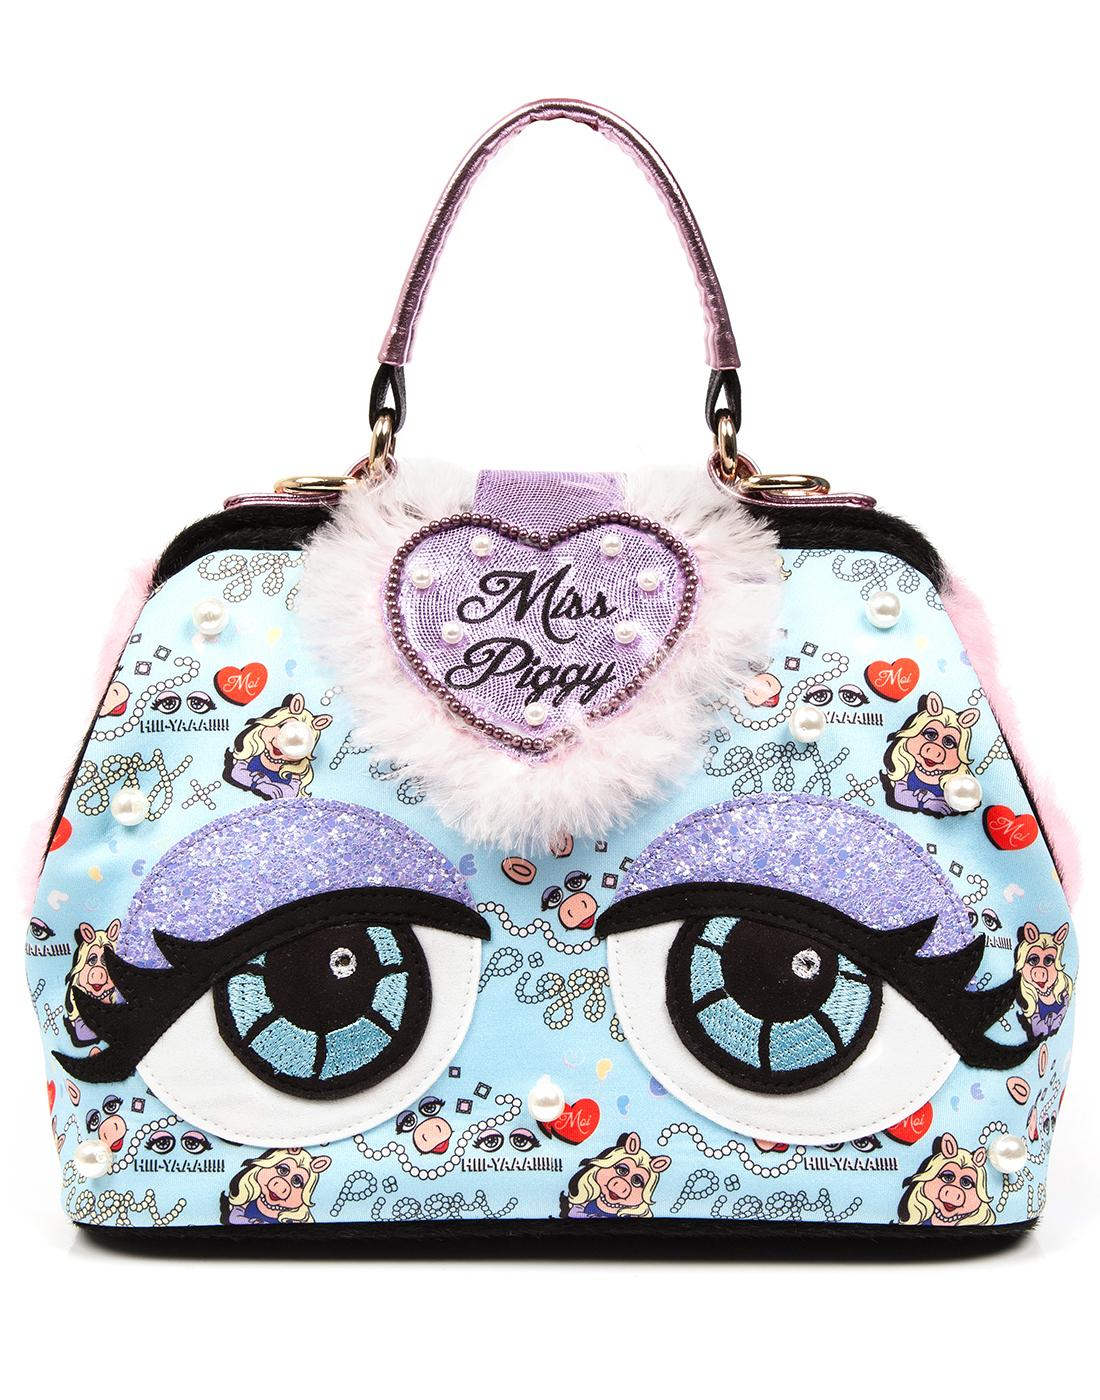 irregular choice handbags